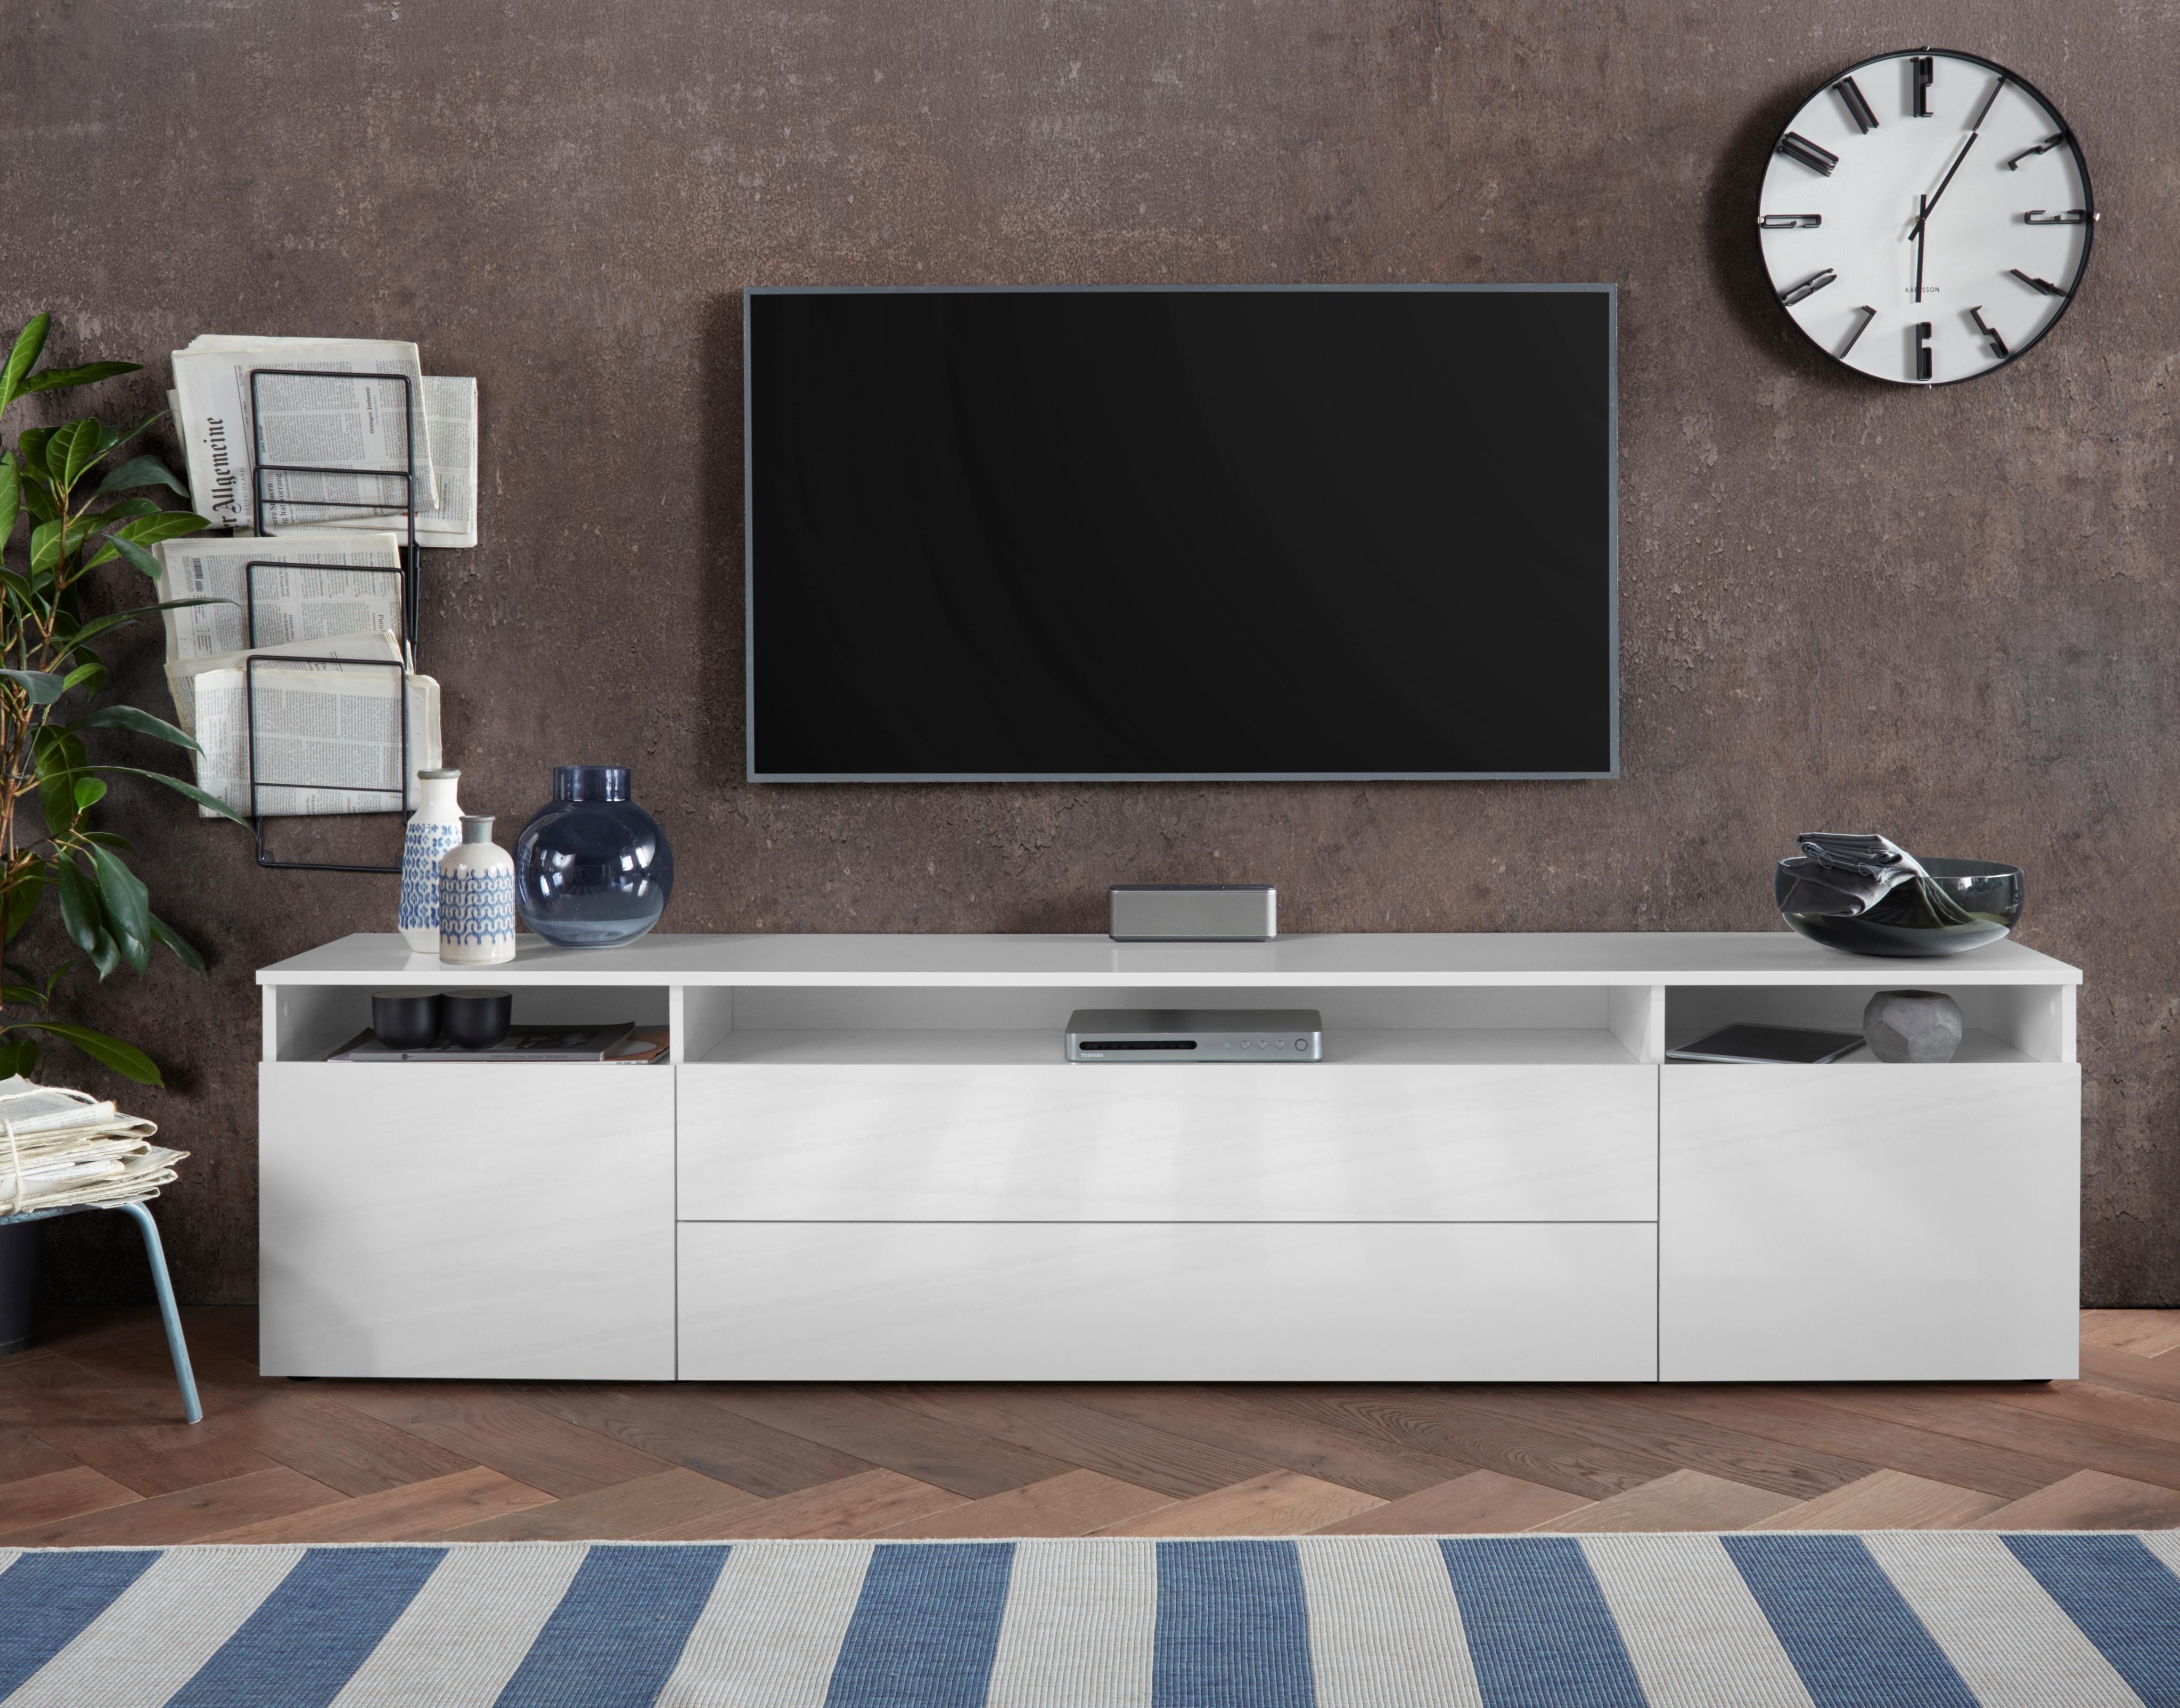 borchardt Möbel tv-meubel »Melbourne« online kopen op otto.nl